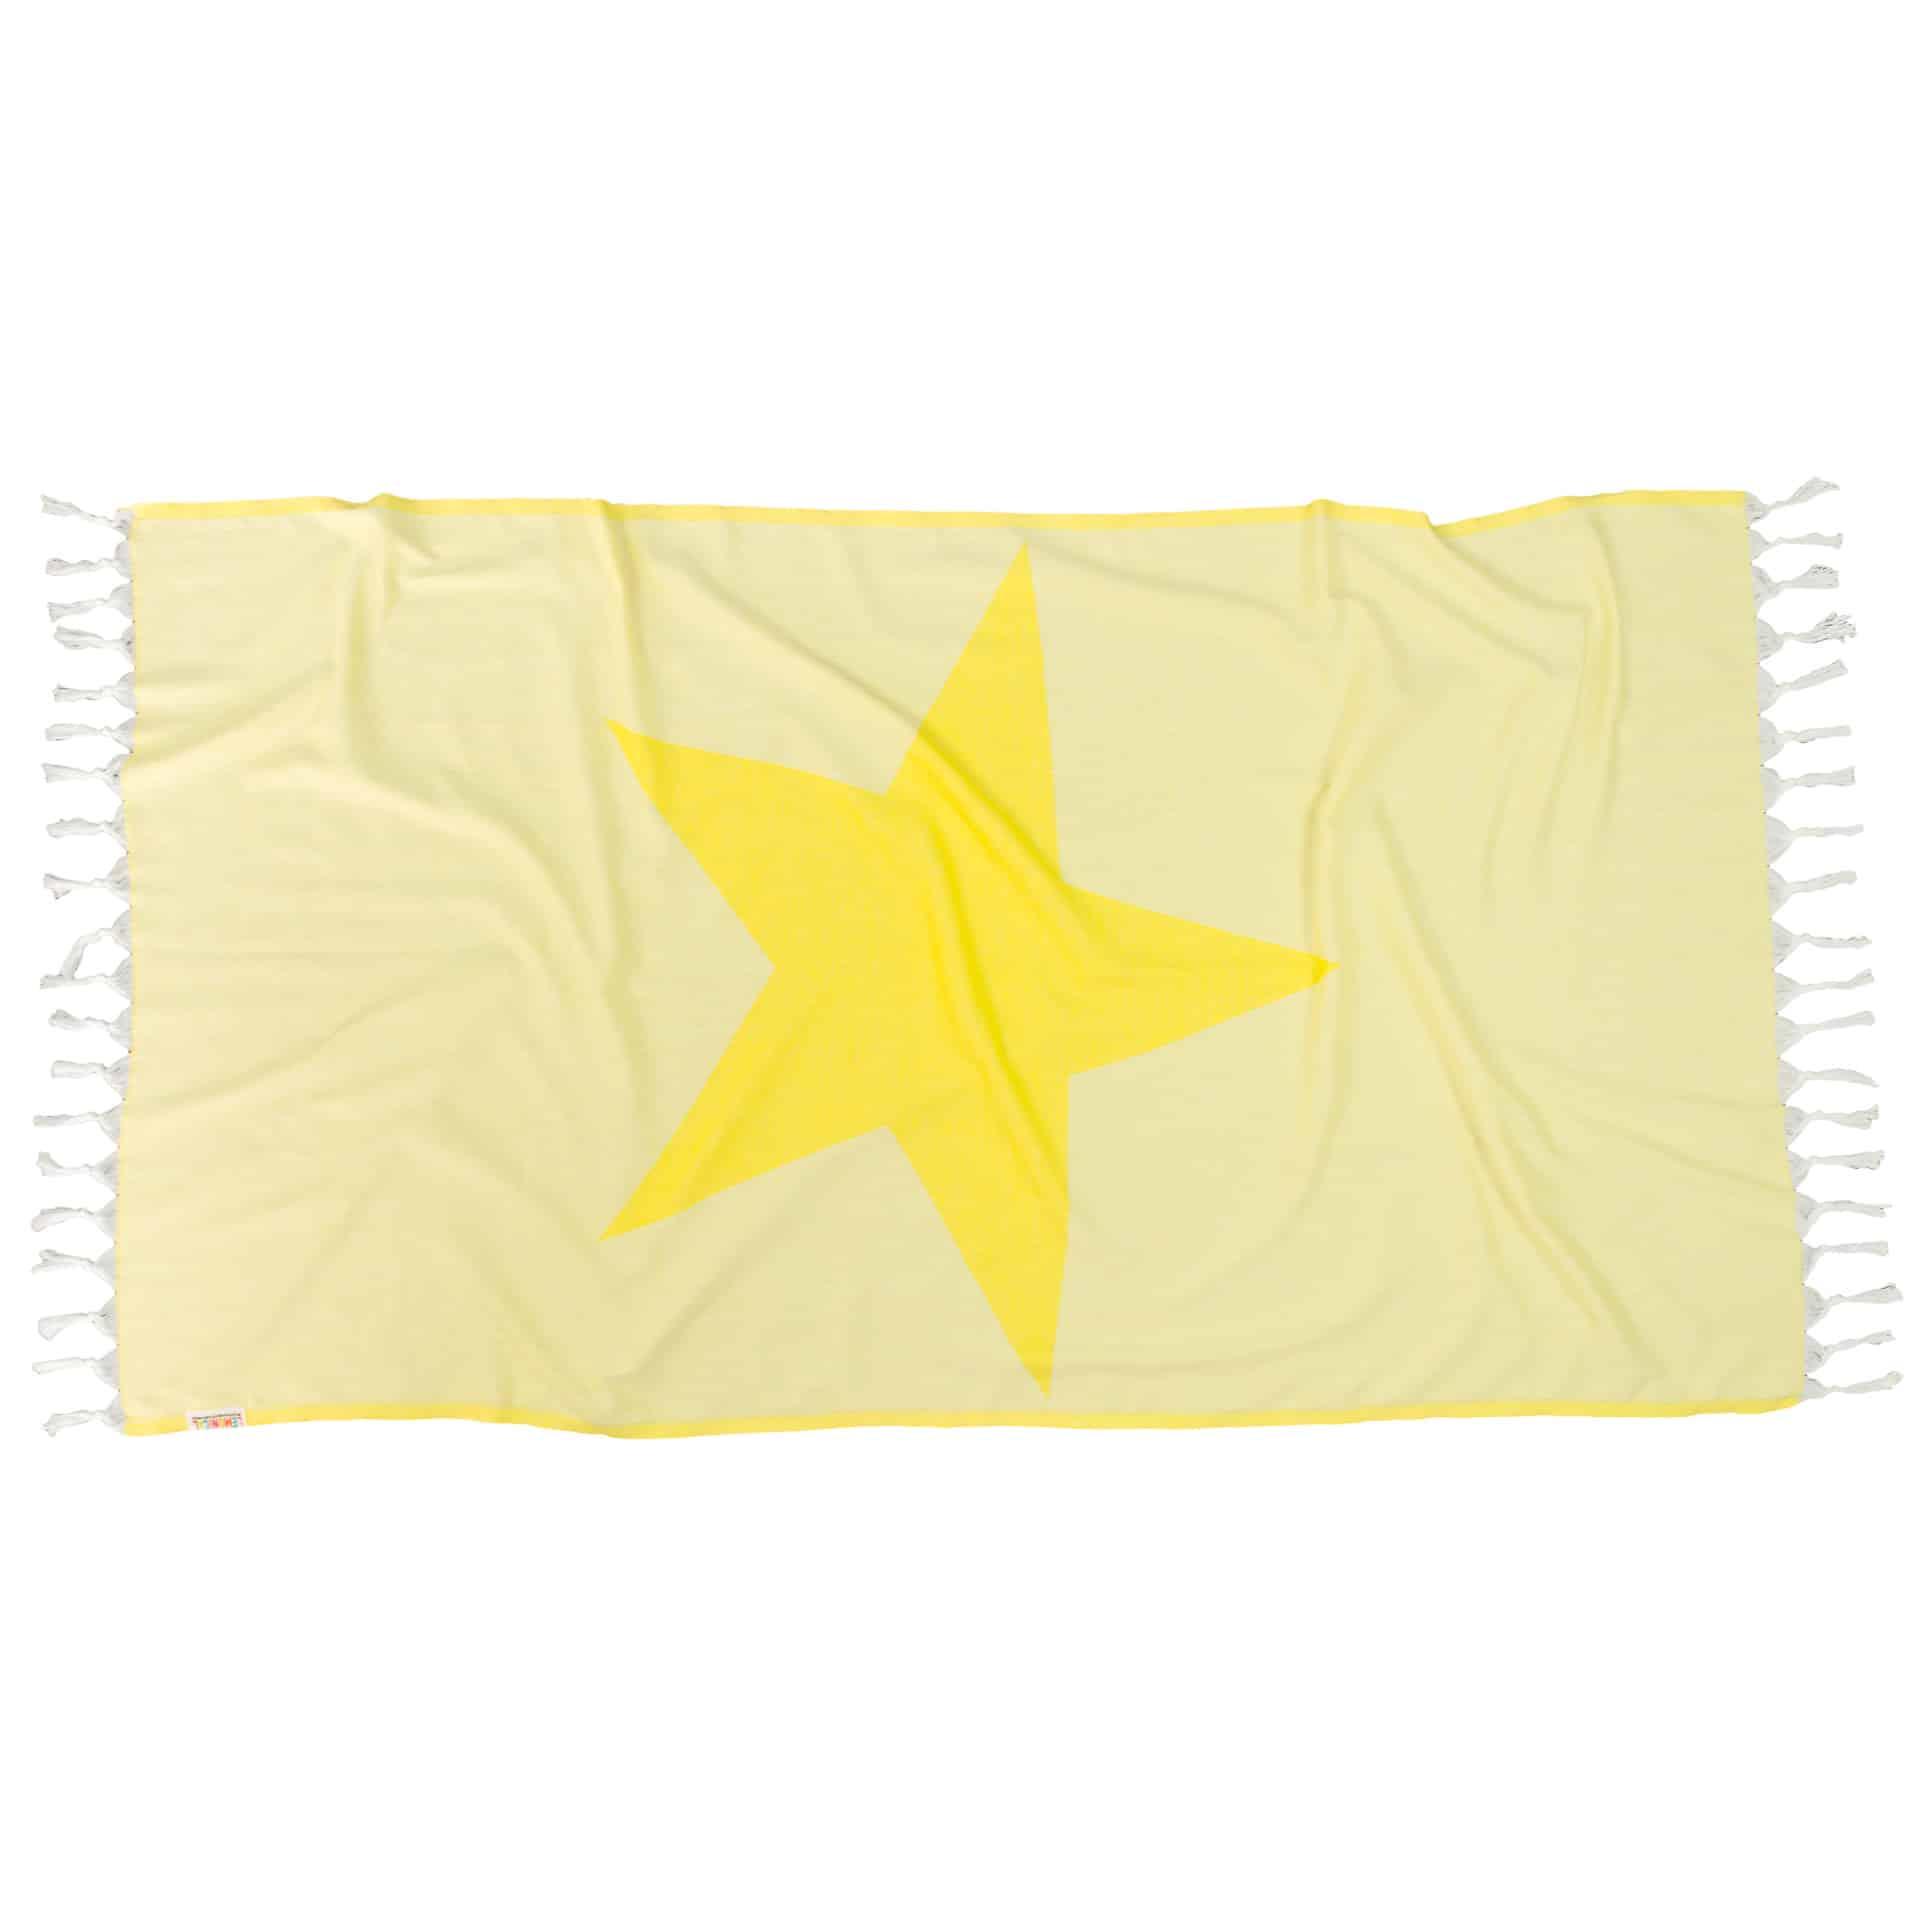 YELLOW-STARFISH-Towel-Lemonical-2